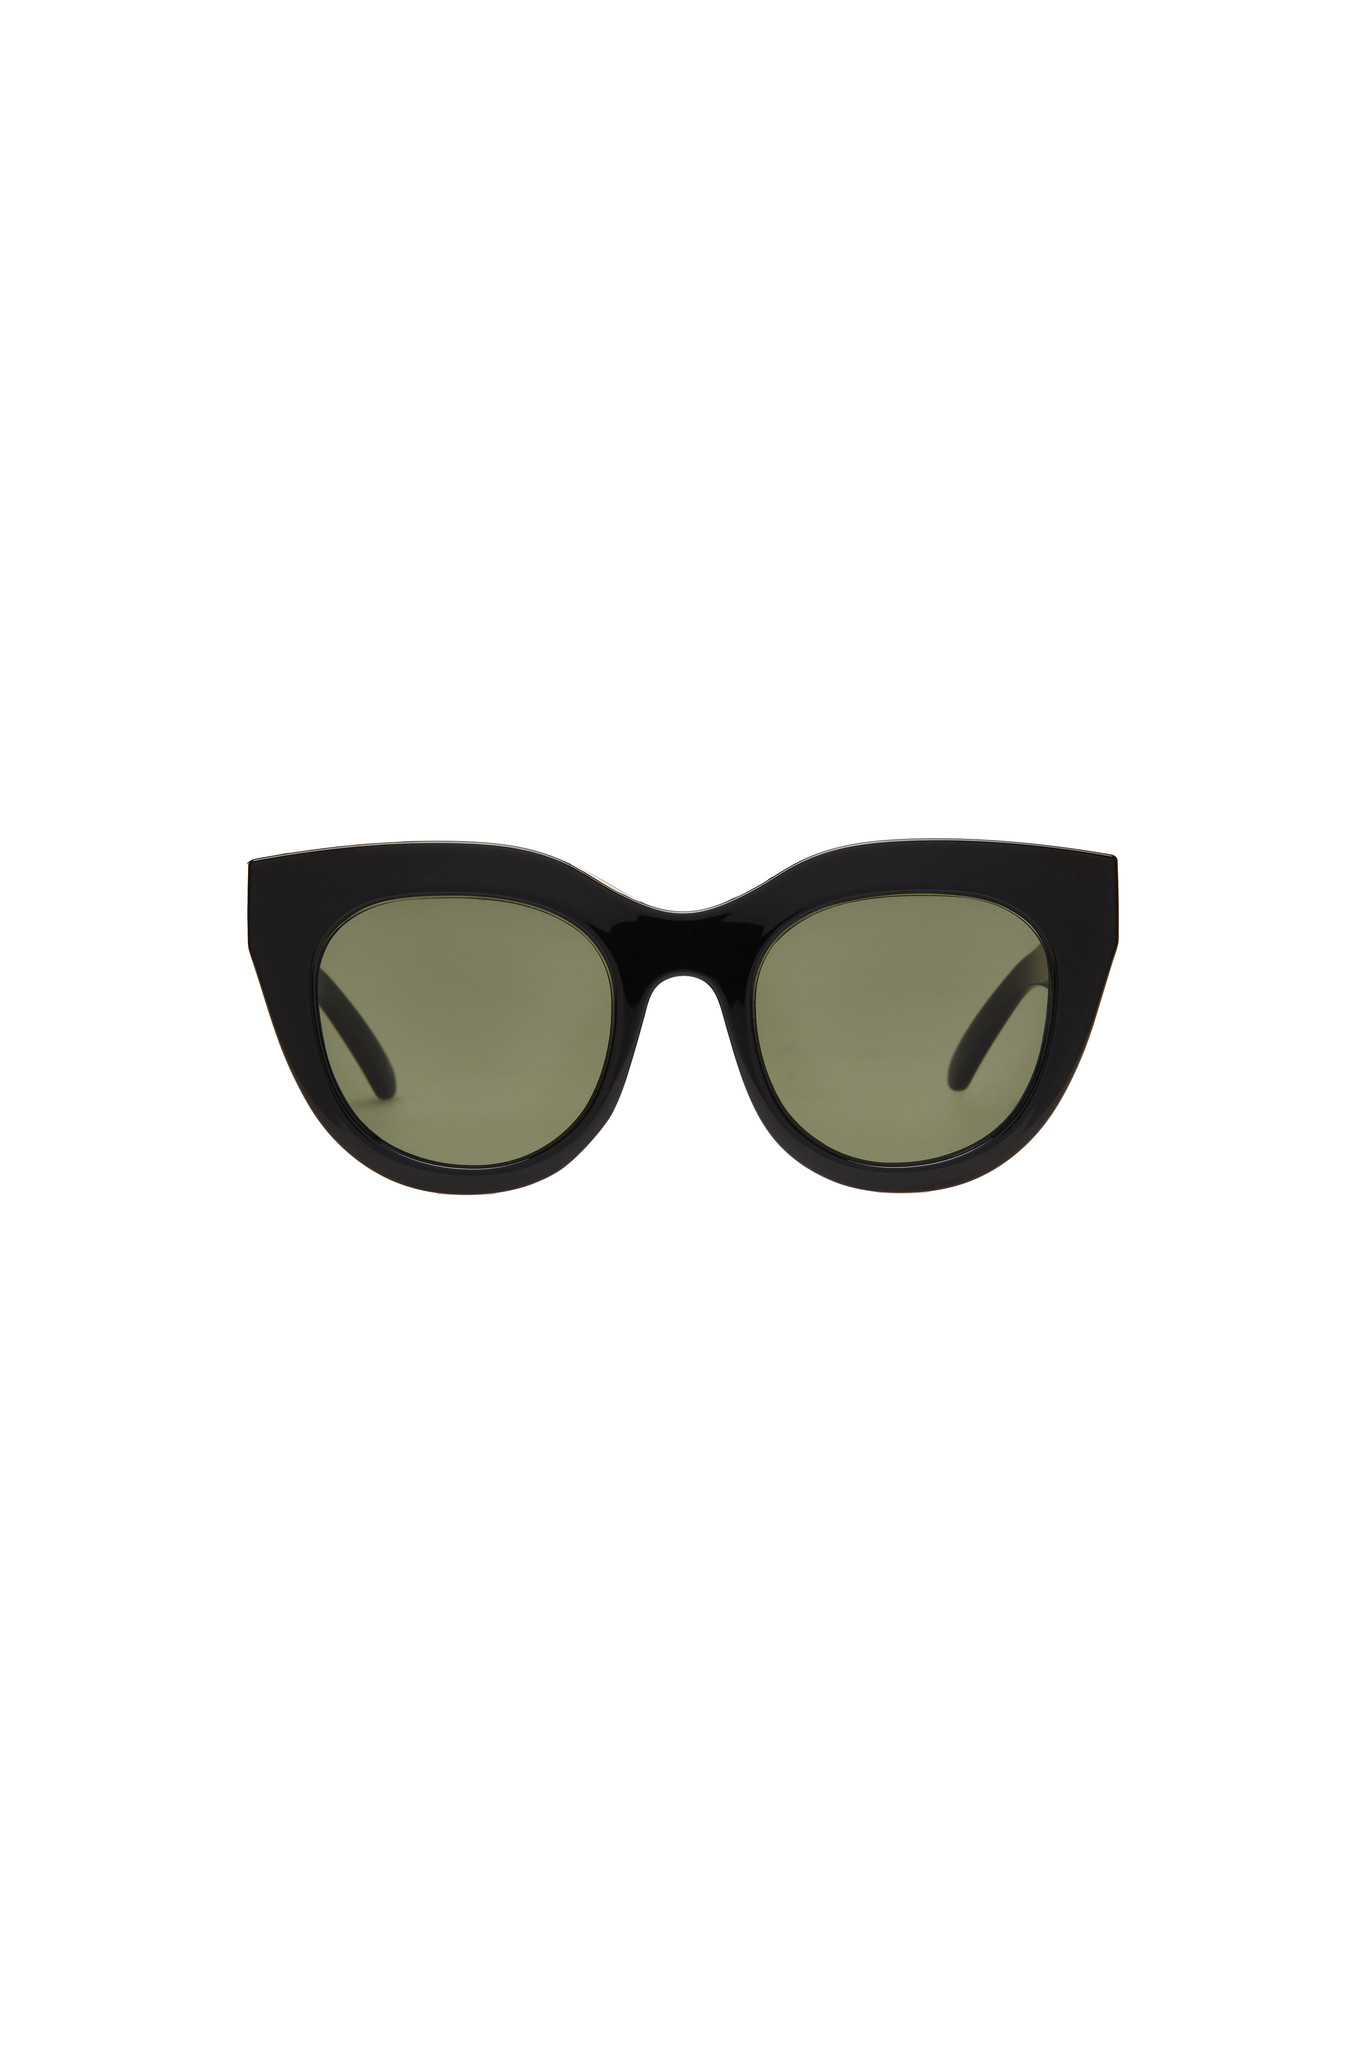 Air Heart Sunglasses - Black-1